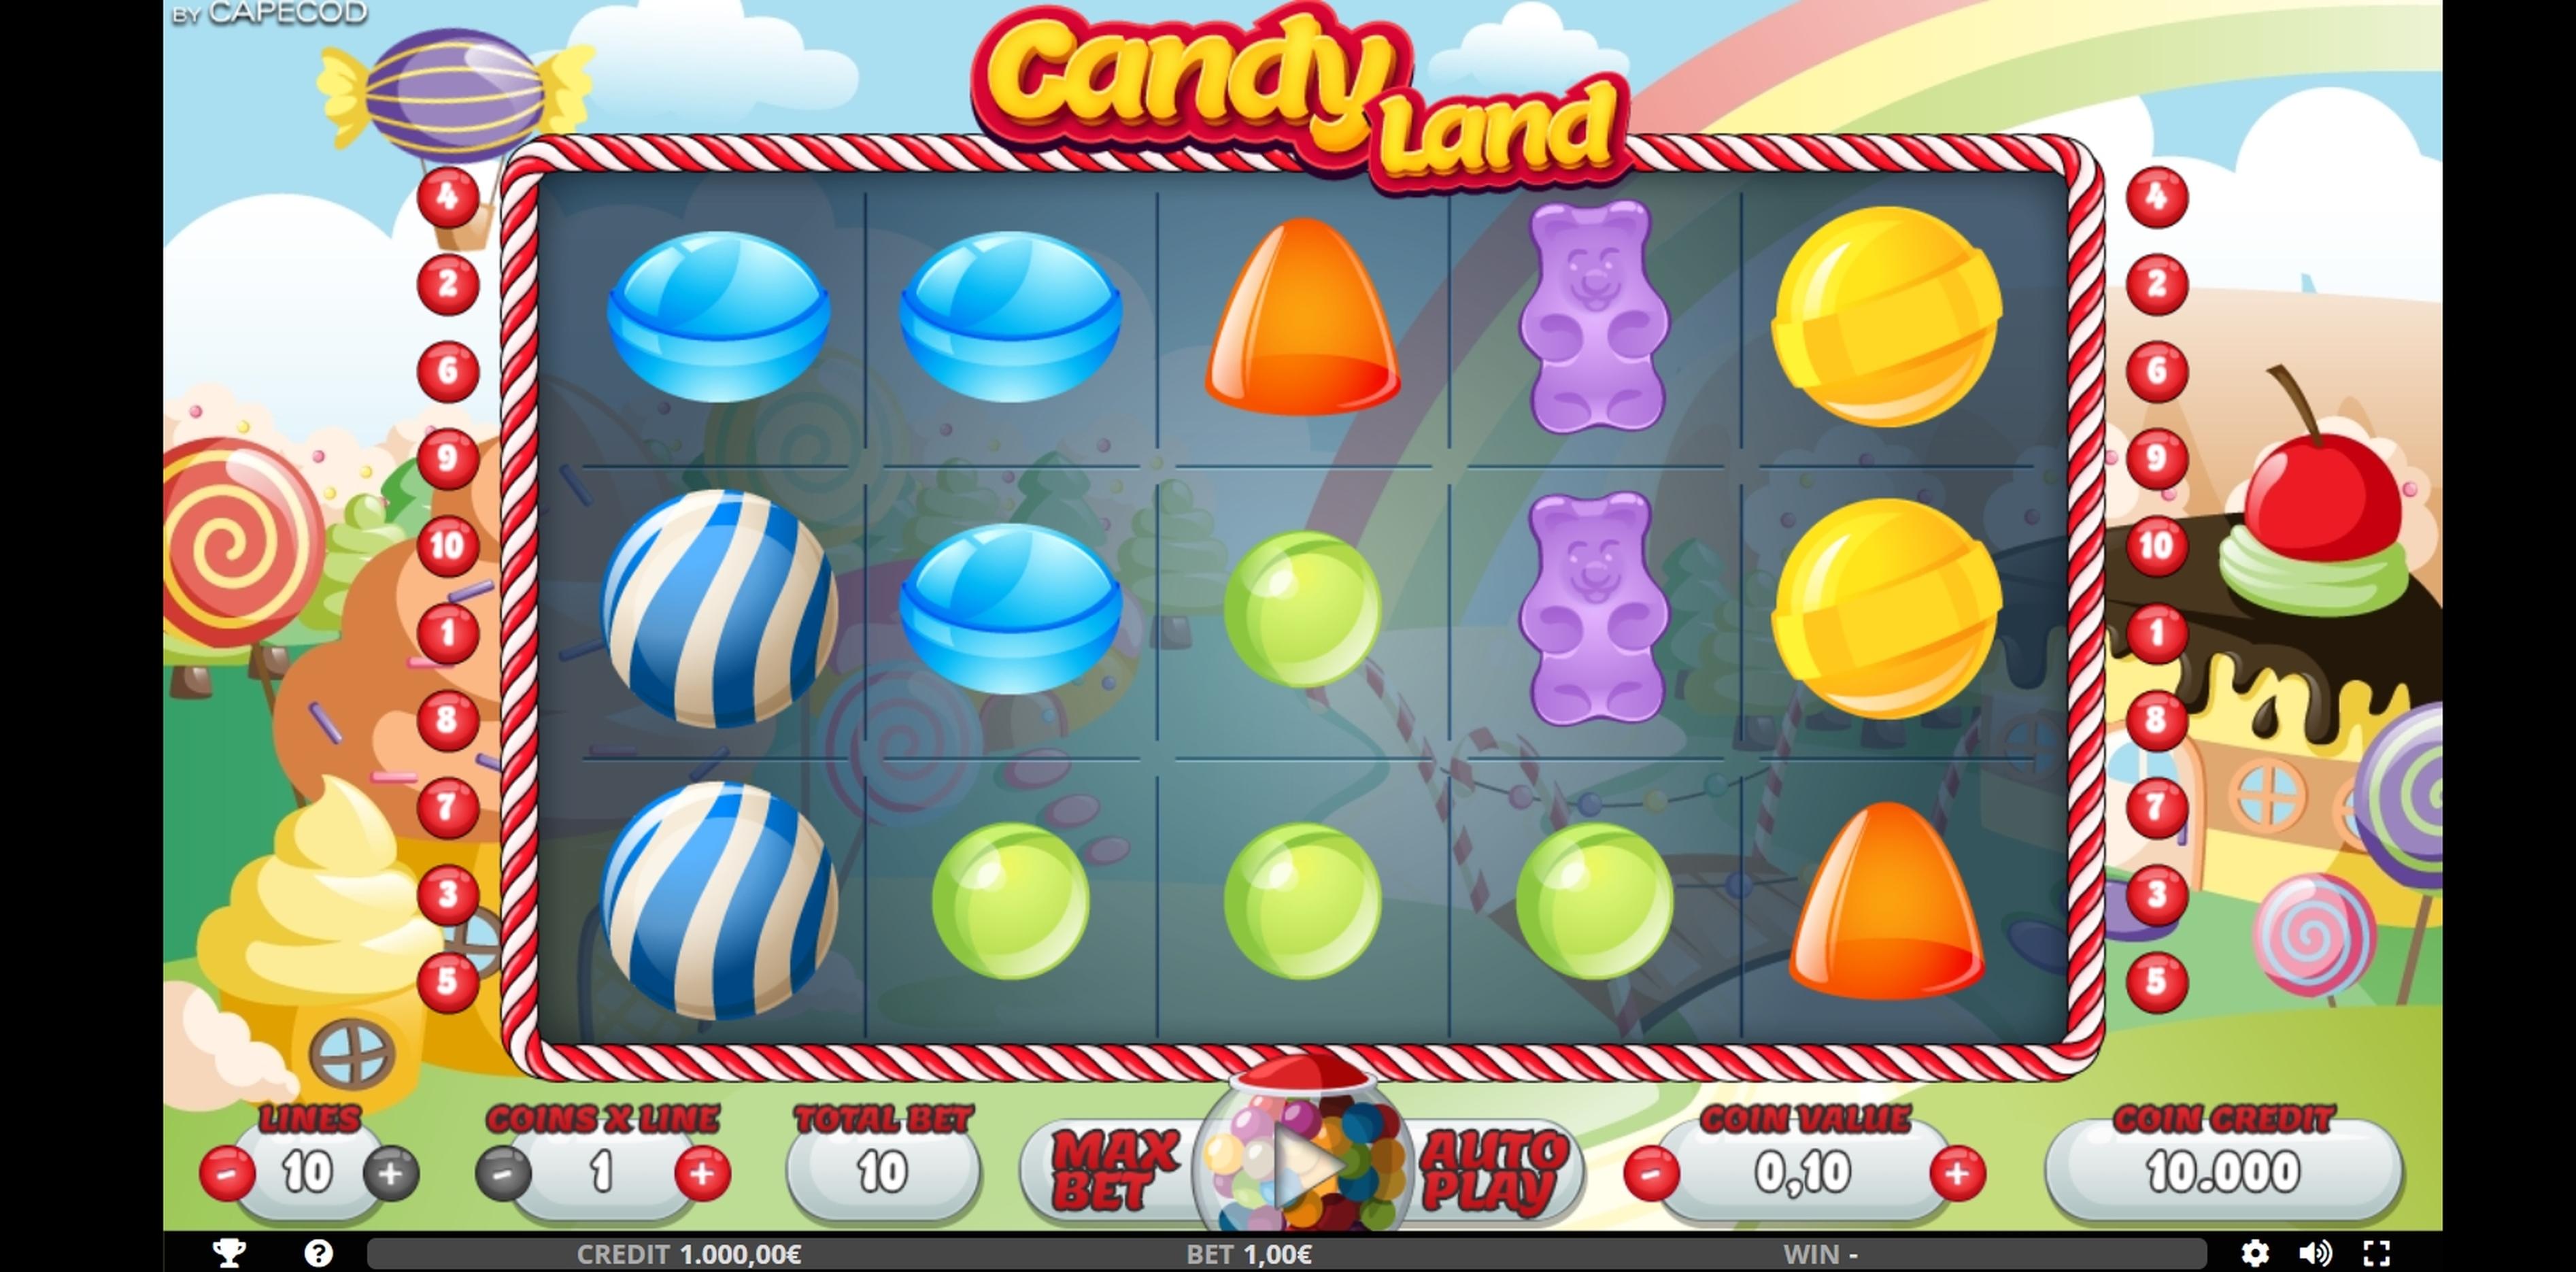 Free Candy Land Slot Machine Online